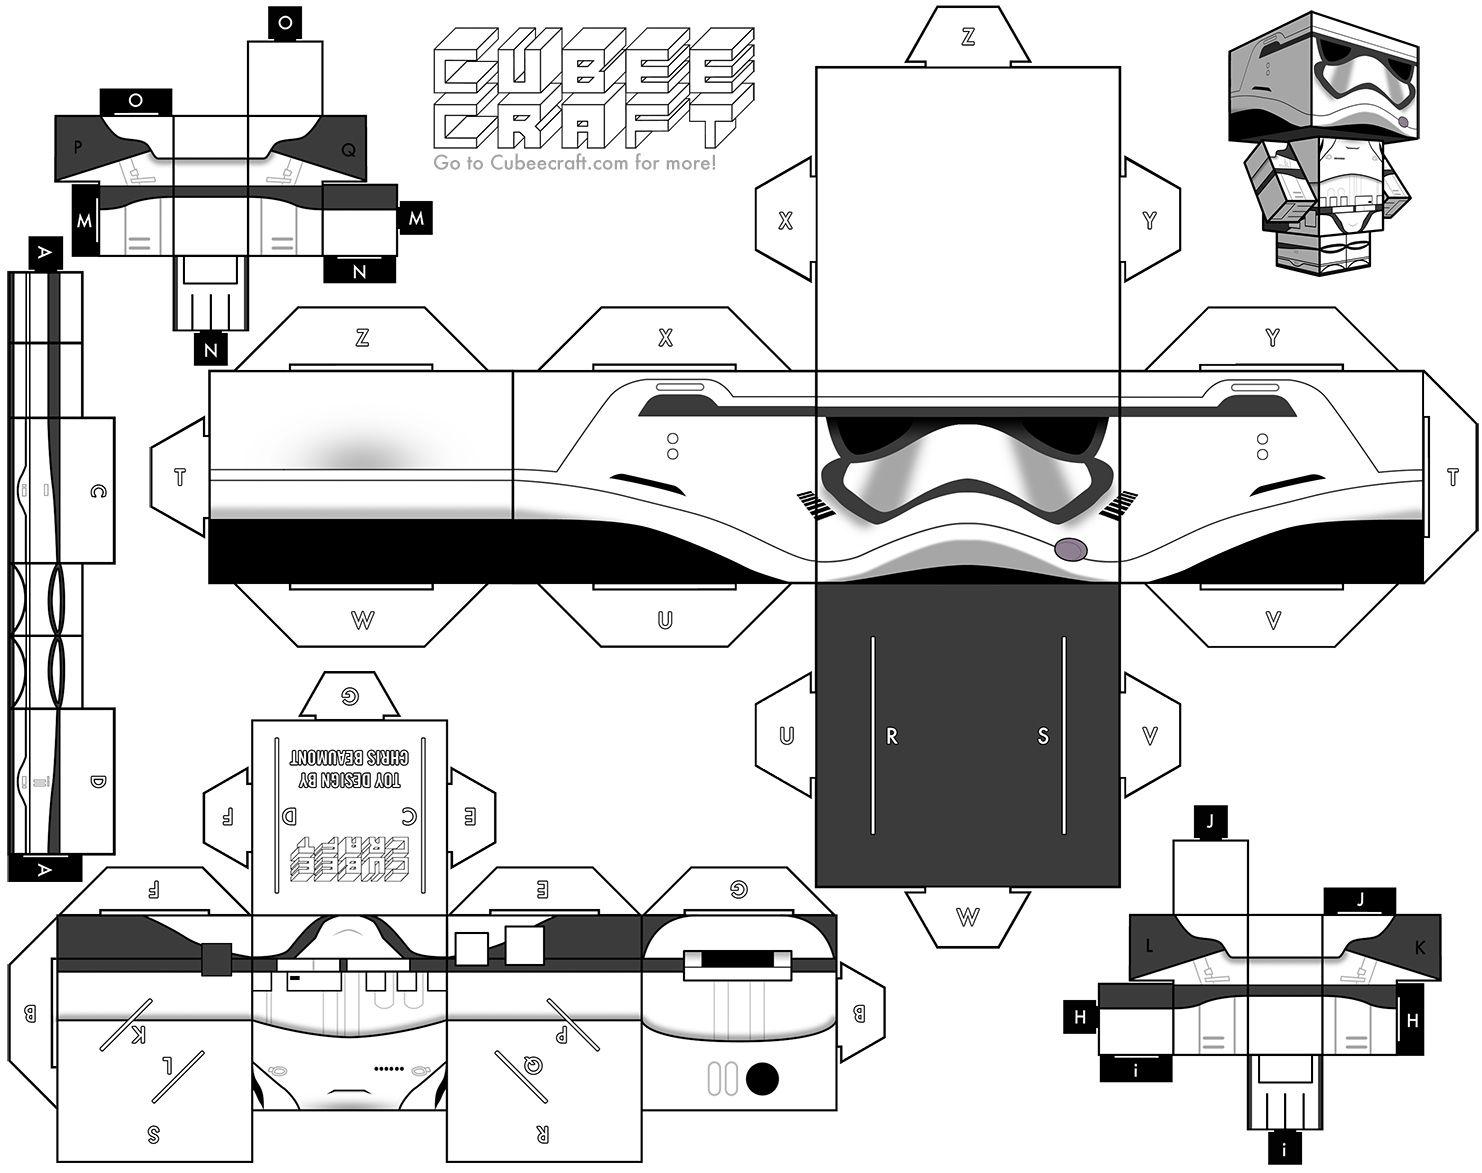 Stormtrooper The Force Awakens Cubeecraft